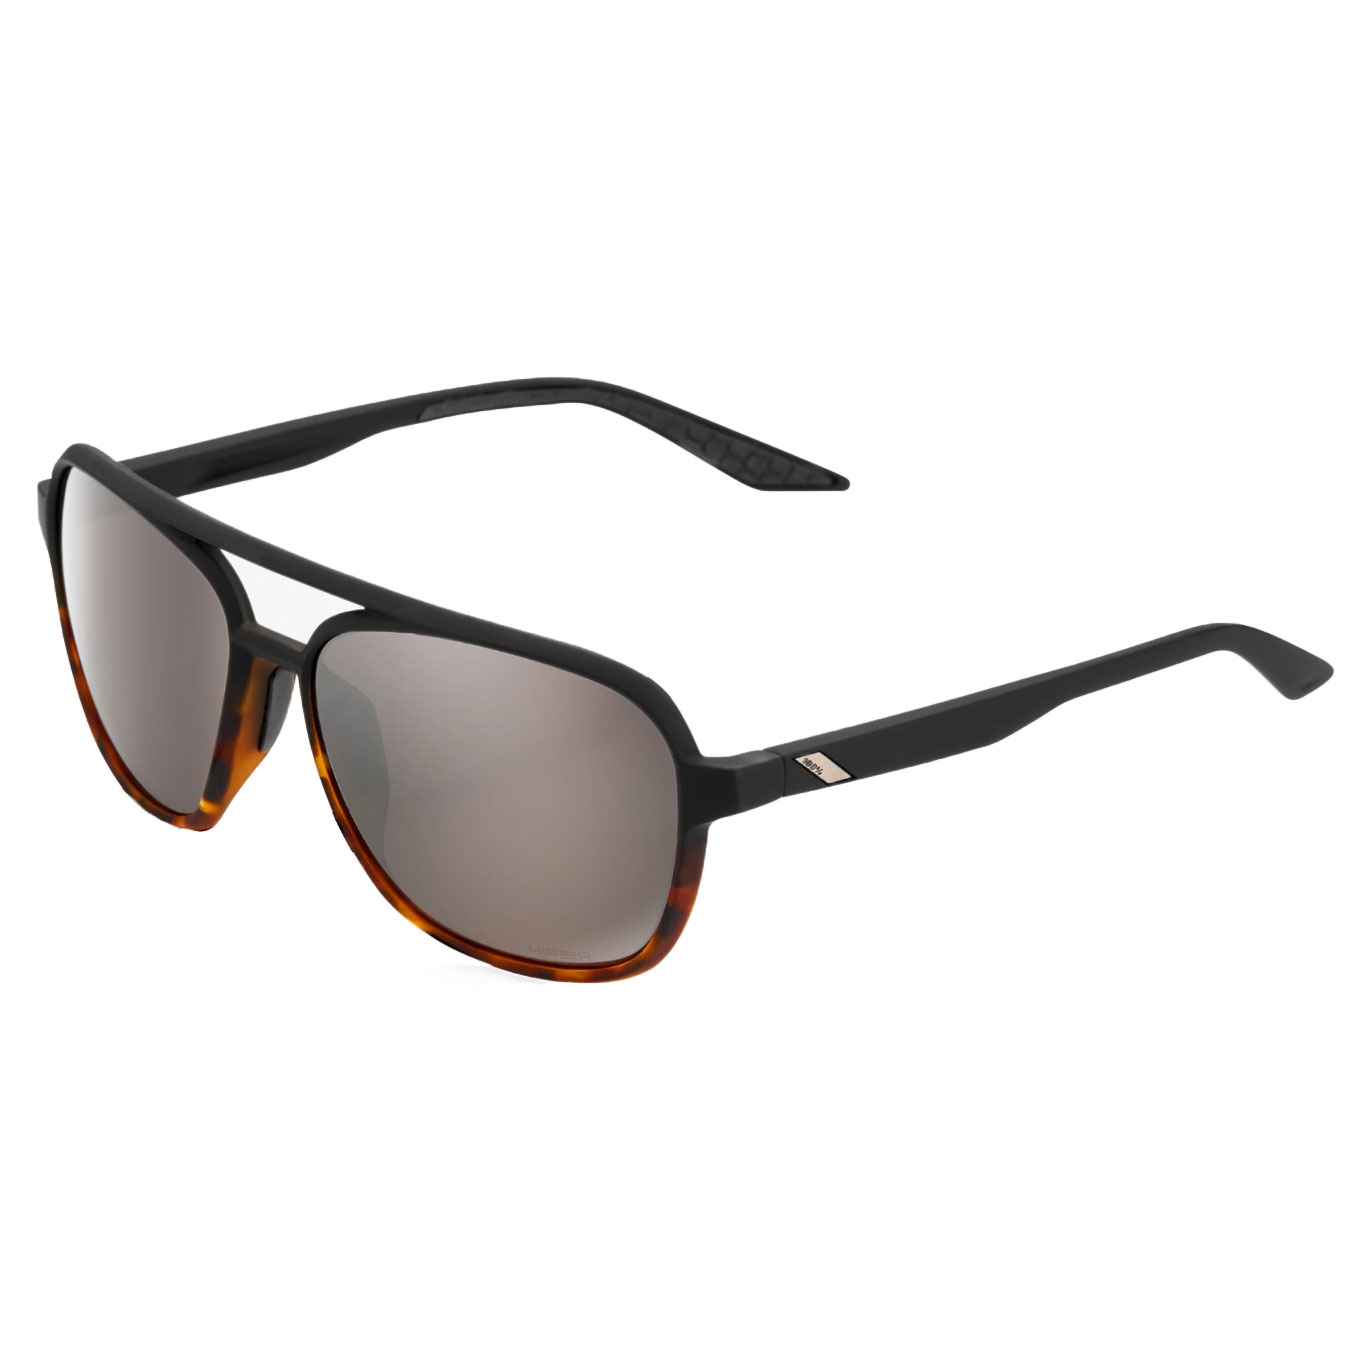 100% Kasia Aviator round Gafas - Soft Tact Black/Havana Fade - HiPER Silver Mirror Lens